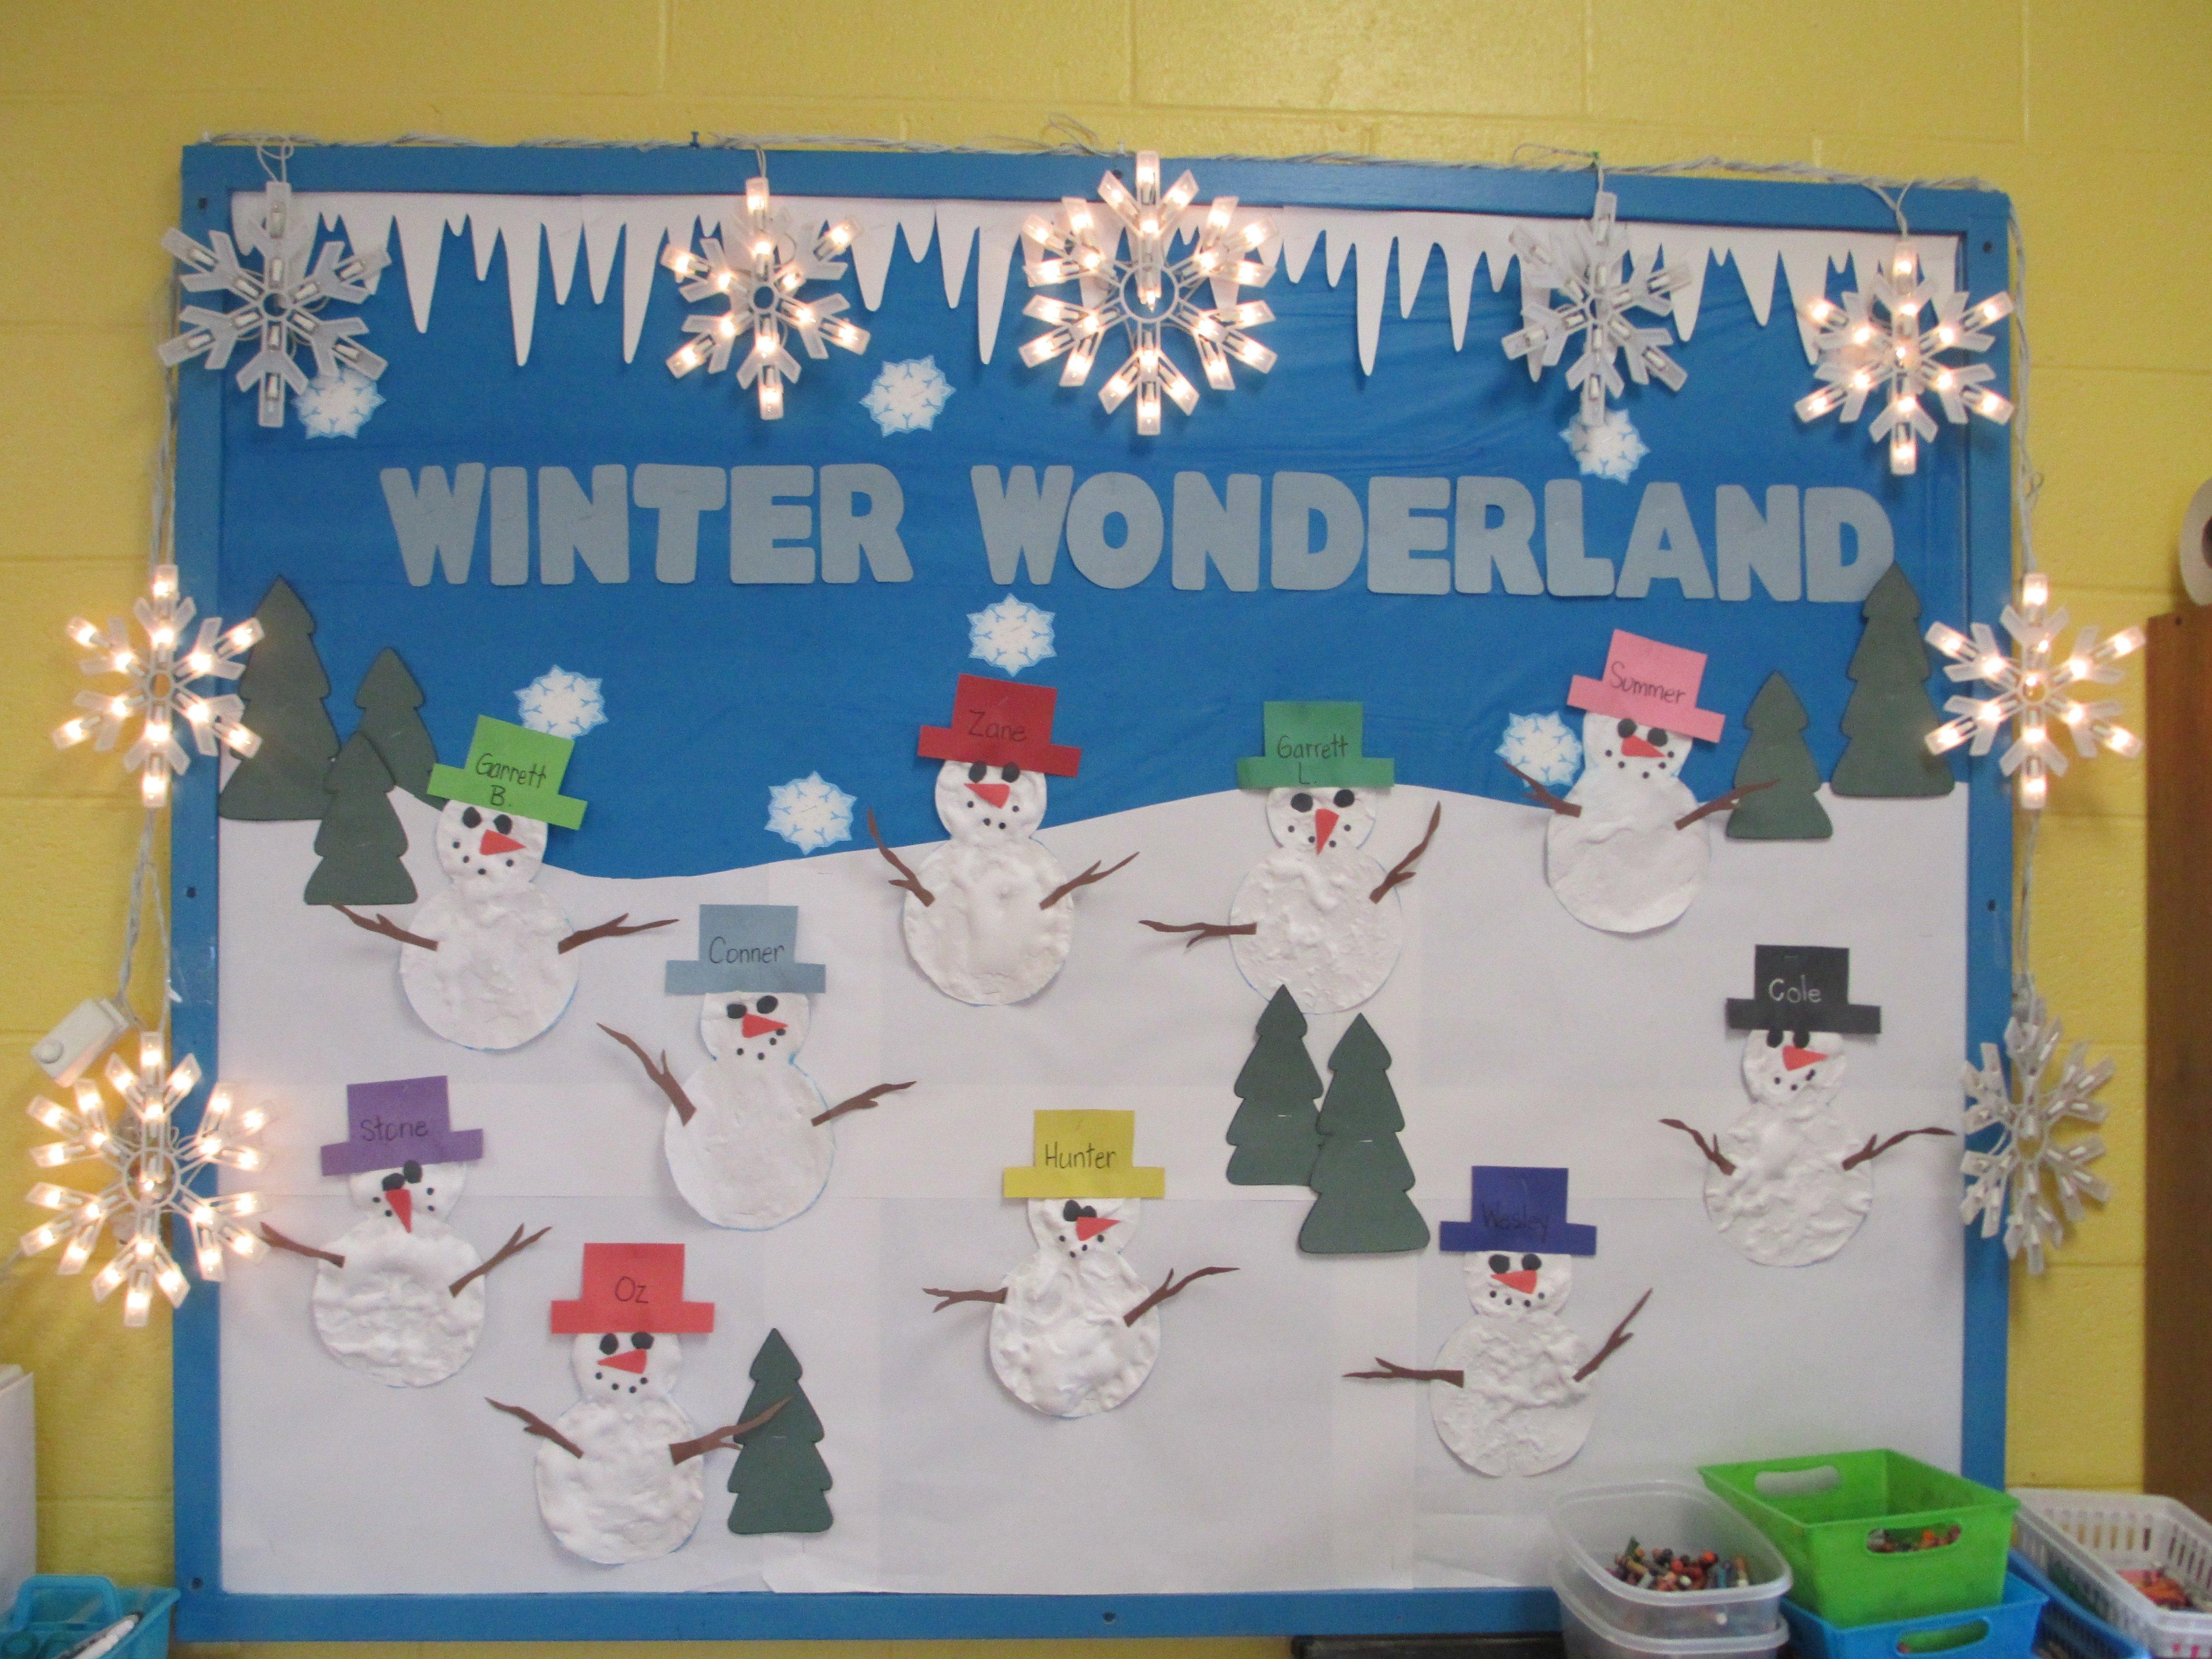 10 Gorgeous Winter Wonderland Bulletin Board Ideas winter wonderland bulletin board miss lisas room pinterest 2021